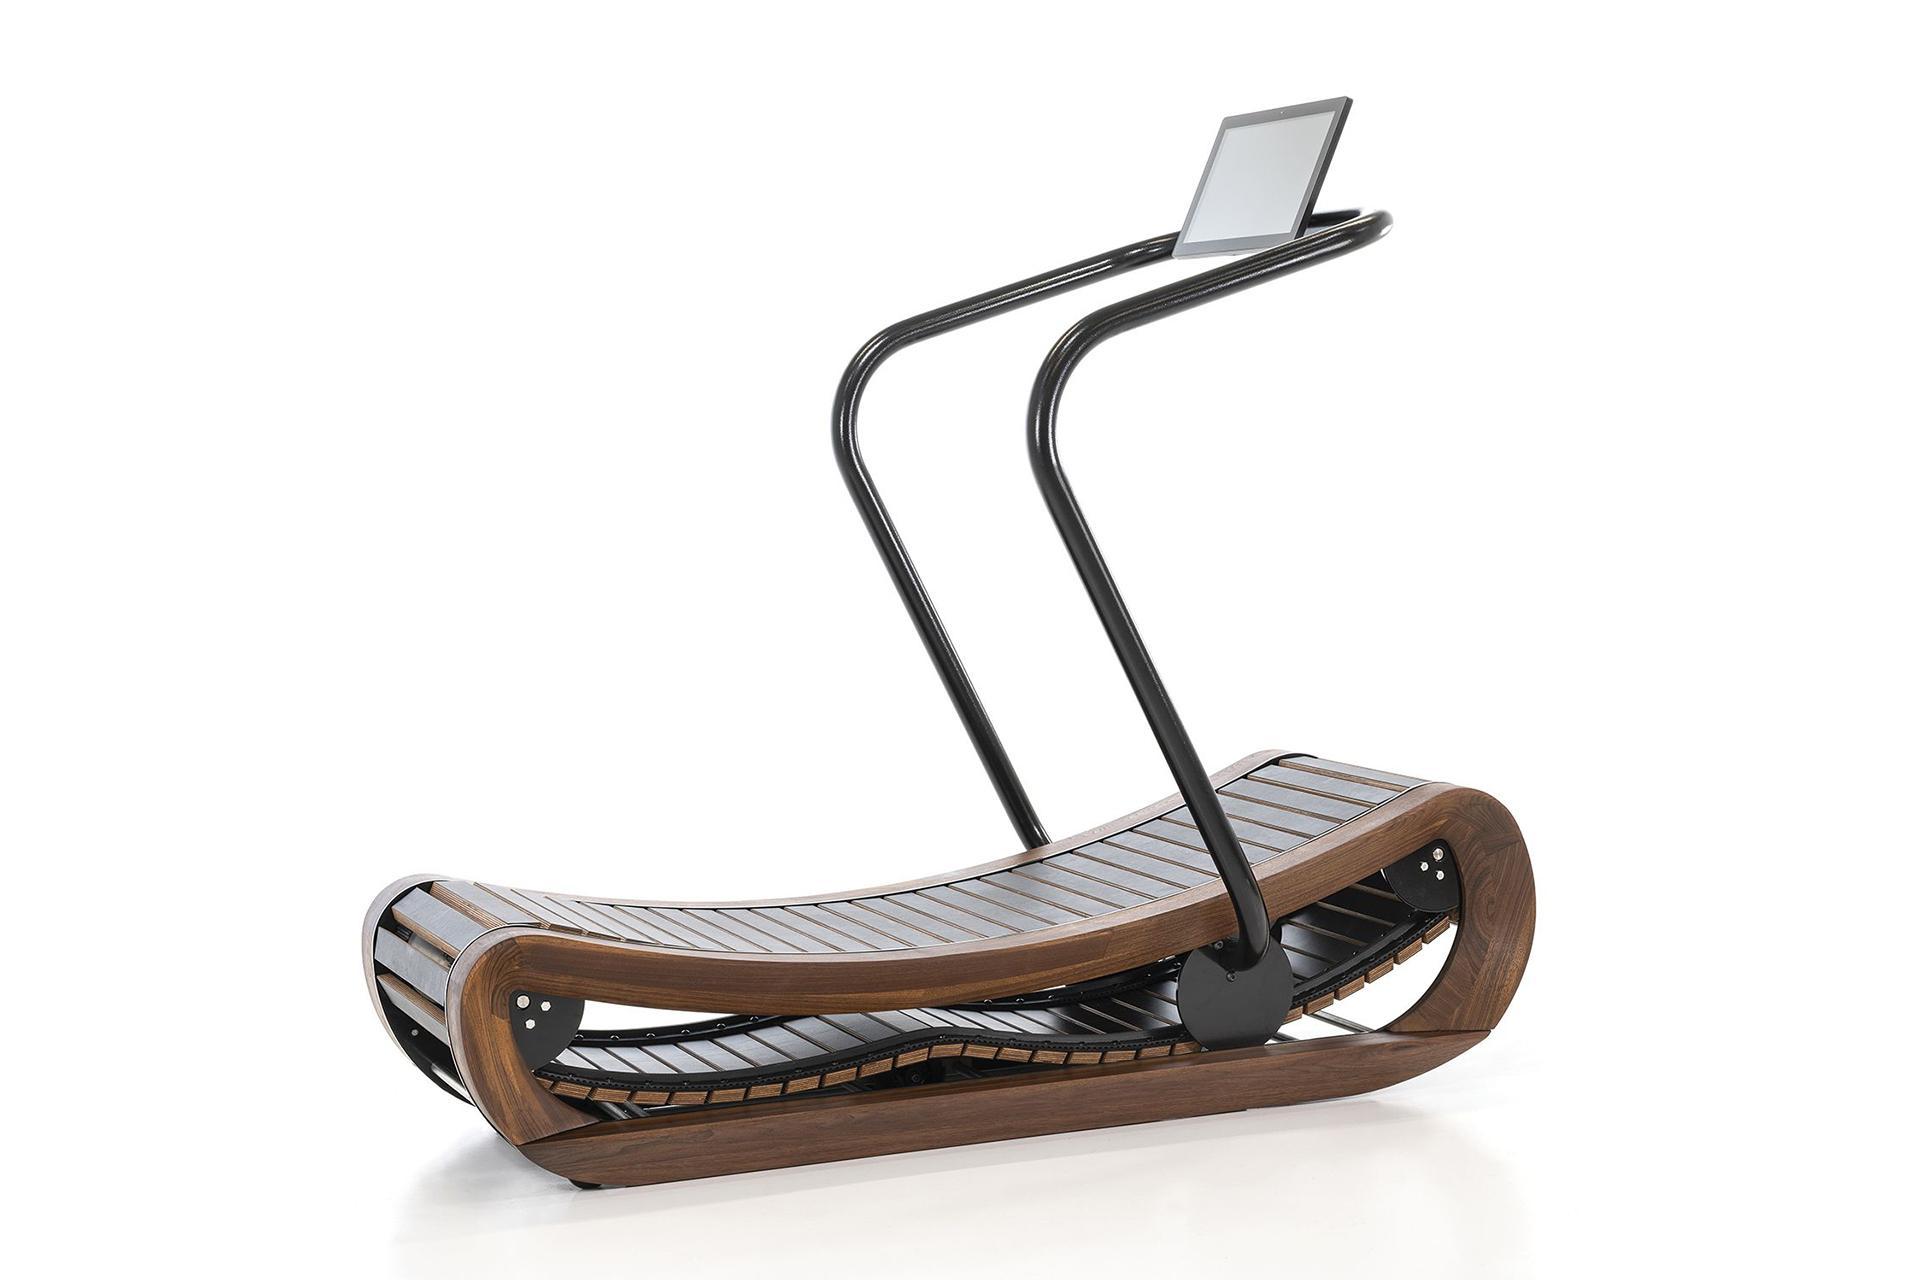 NOHrD SprintBok Treadmill